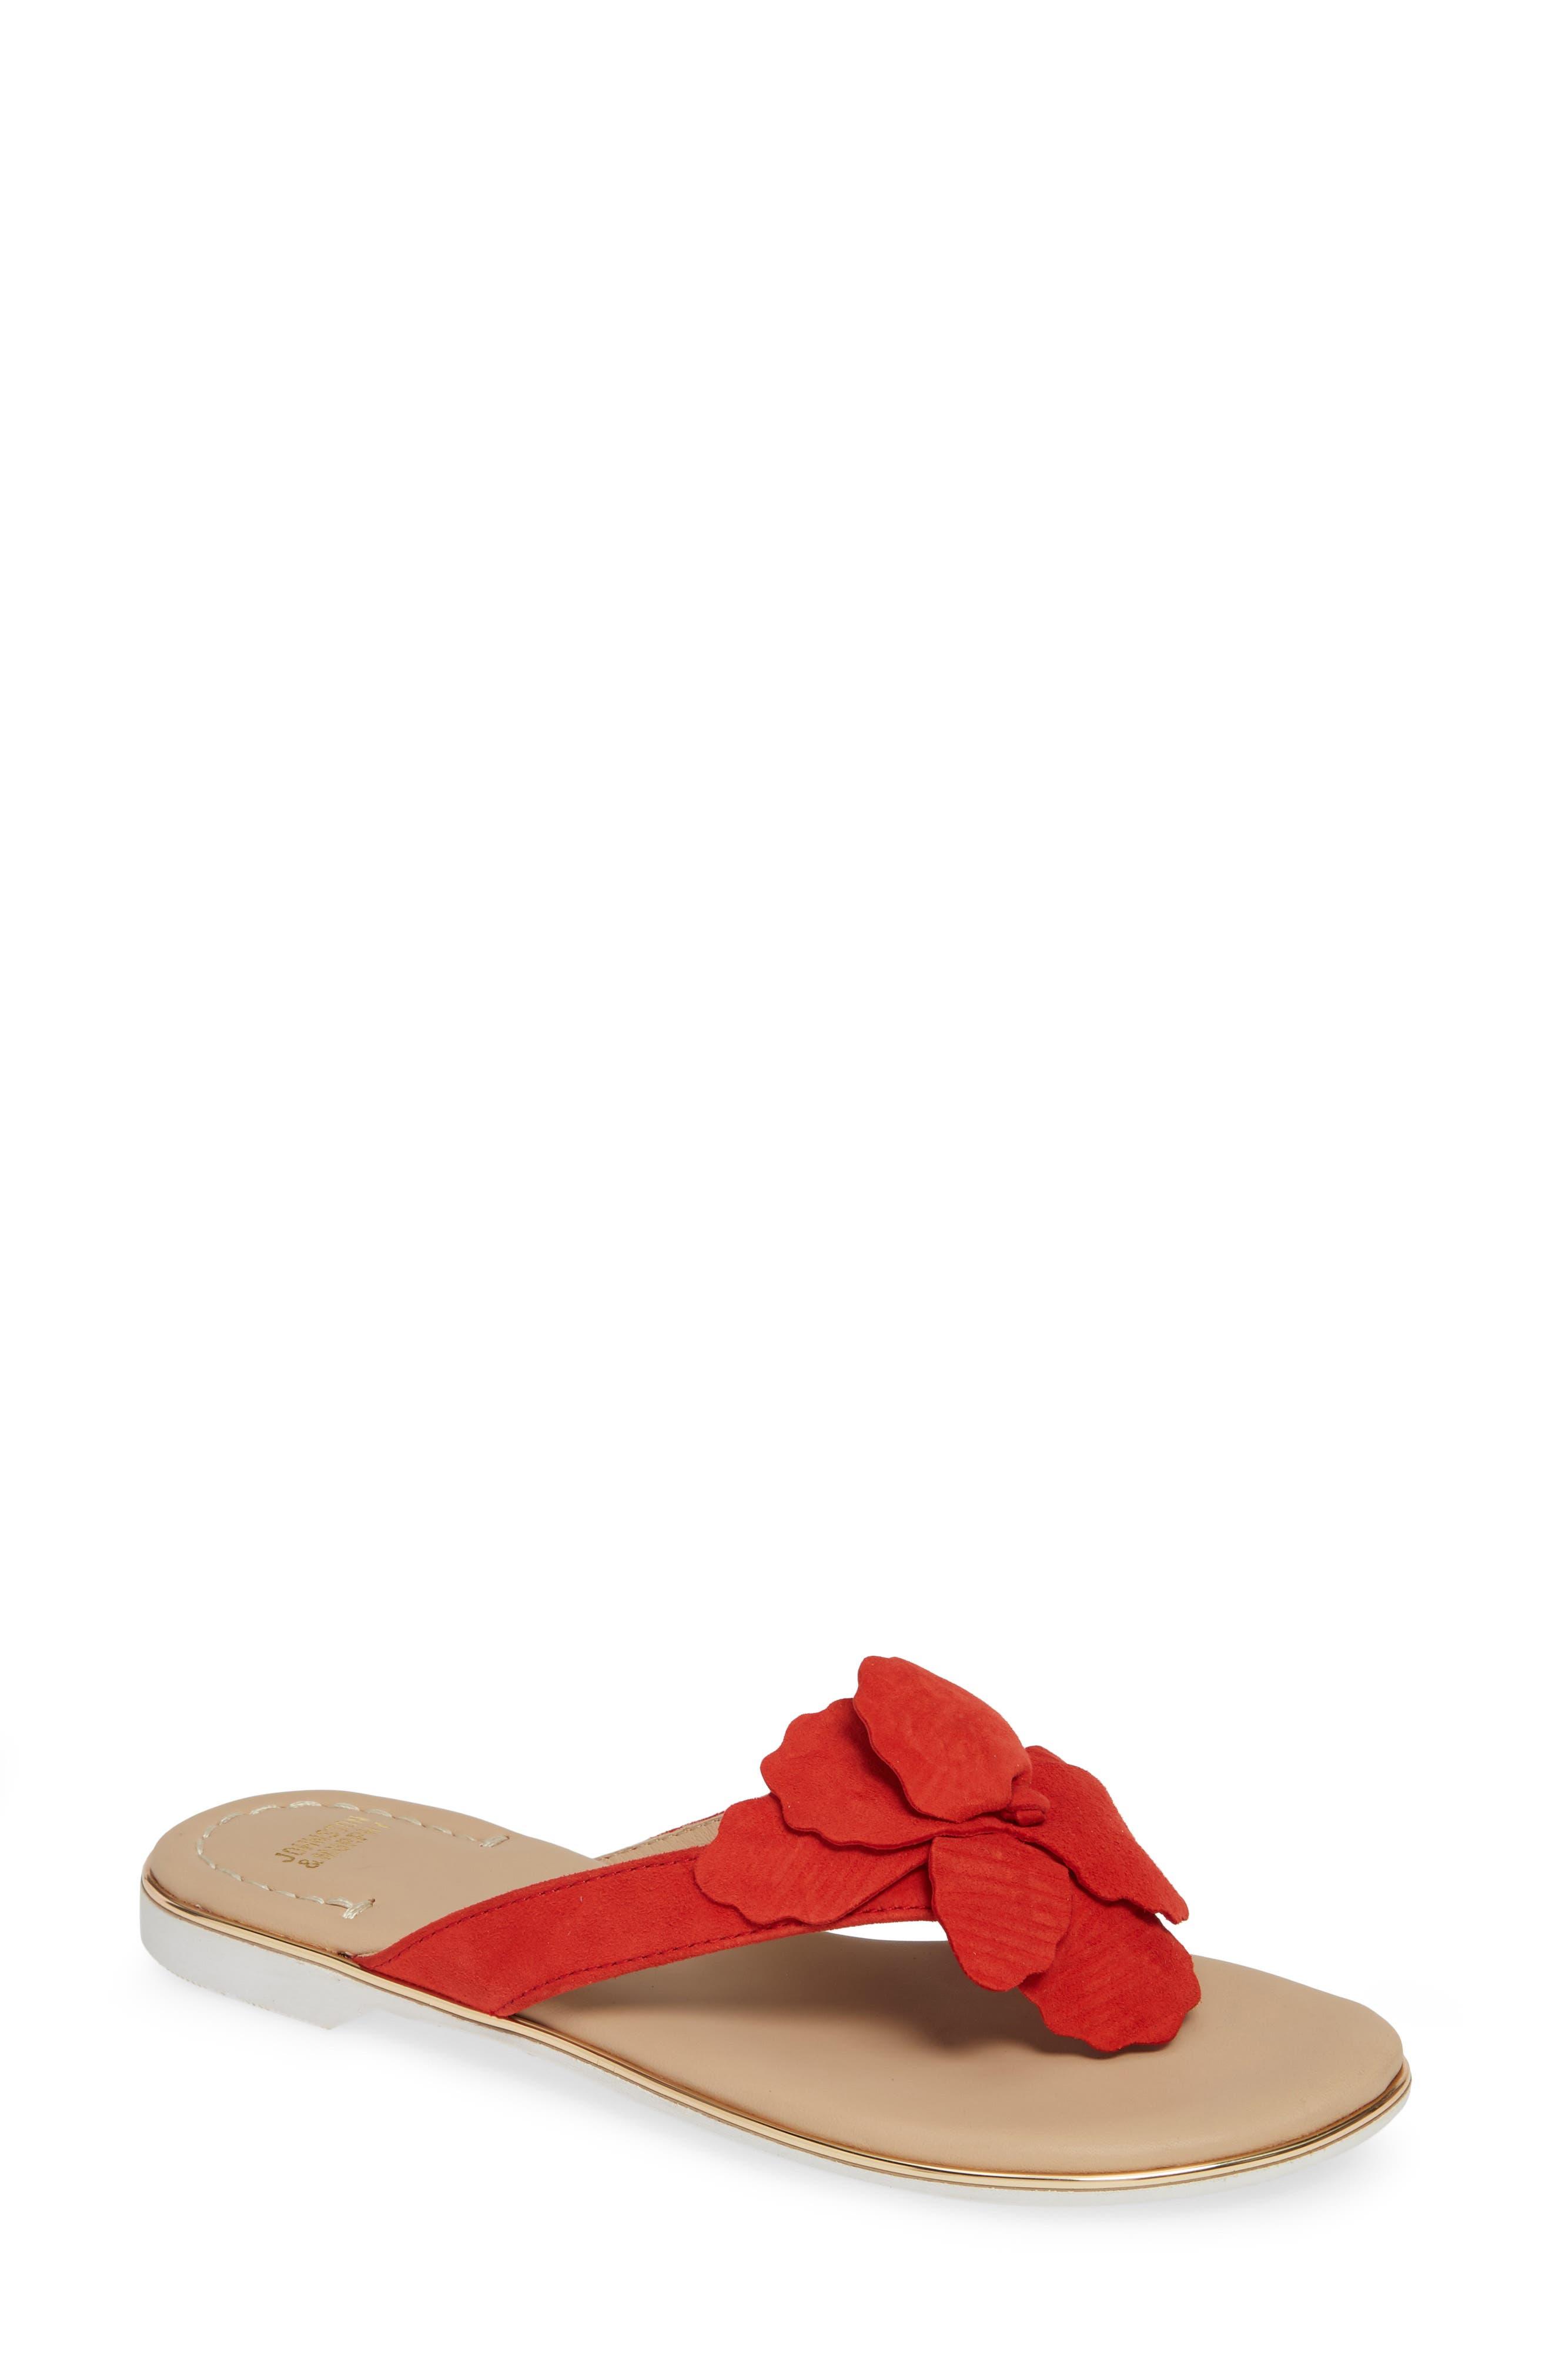 Johnston & Murphy Reanne Flip Flop, Red